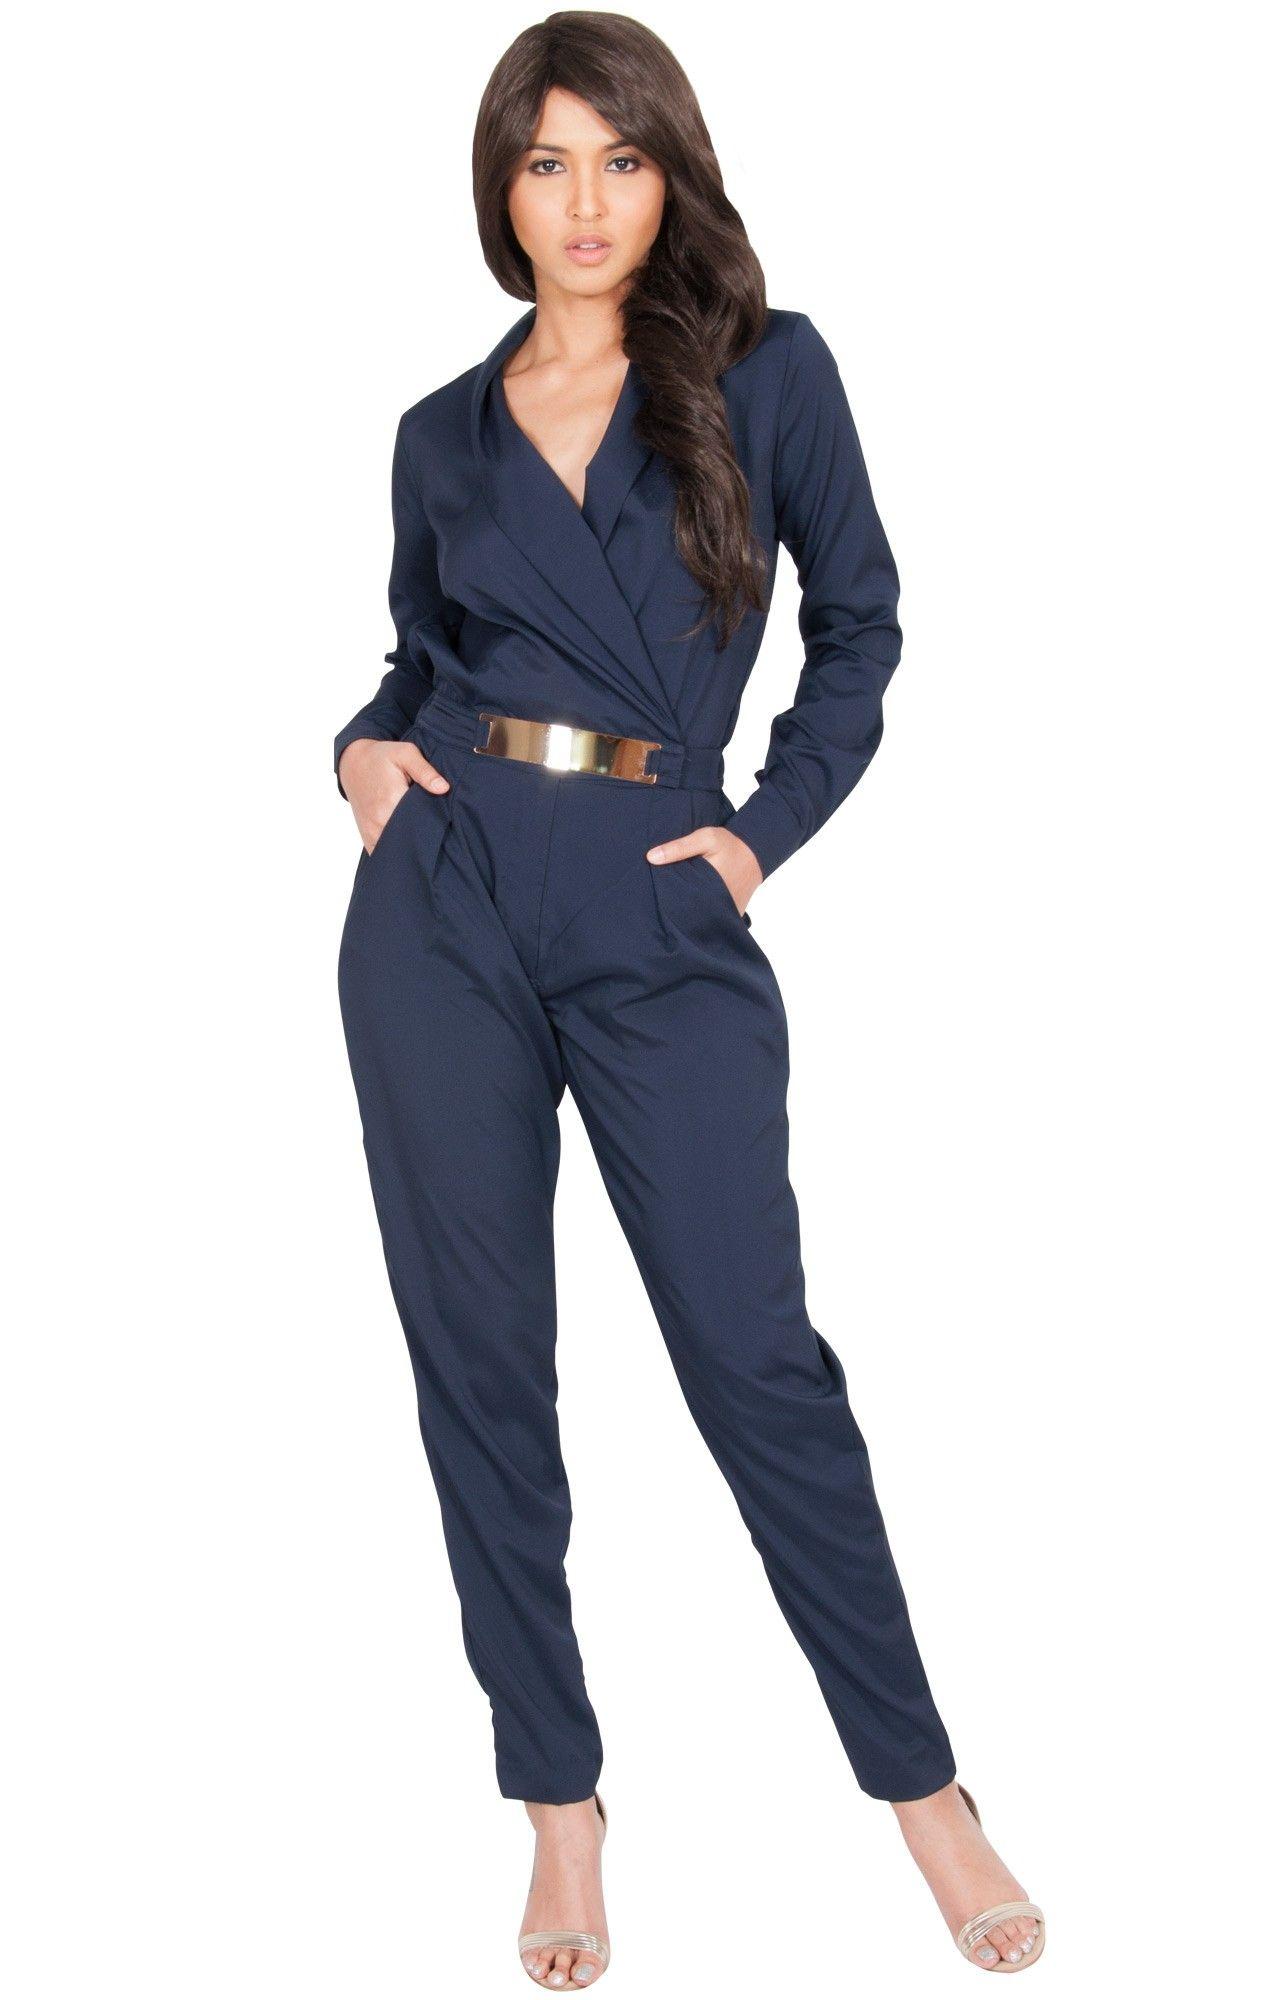 735e0ae336b9 ROSLIN - Long Sleeve Metallic Belt Chic Jumpsuit